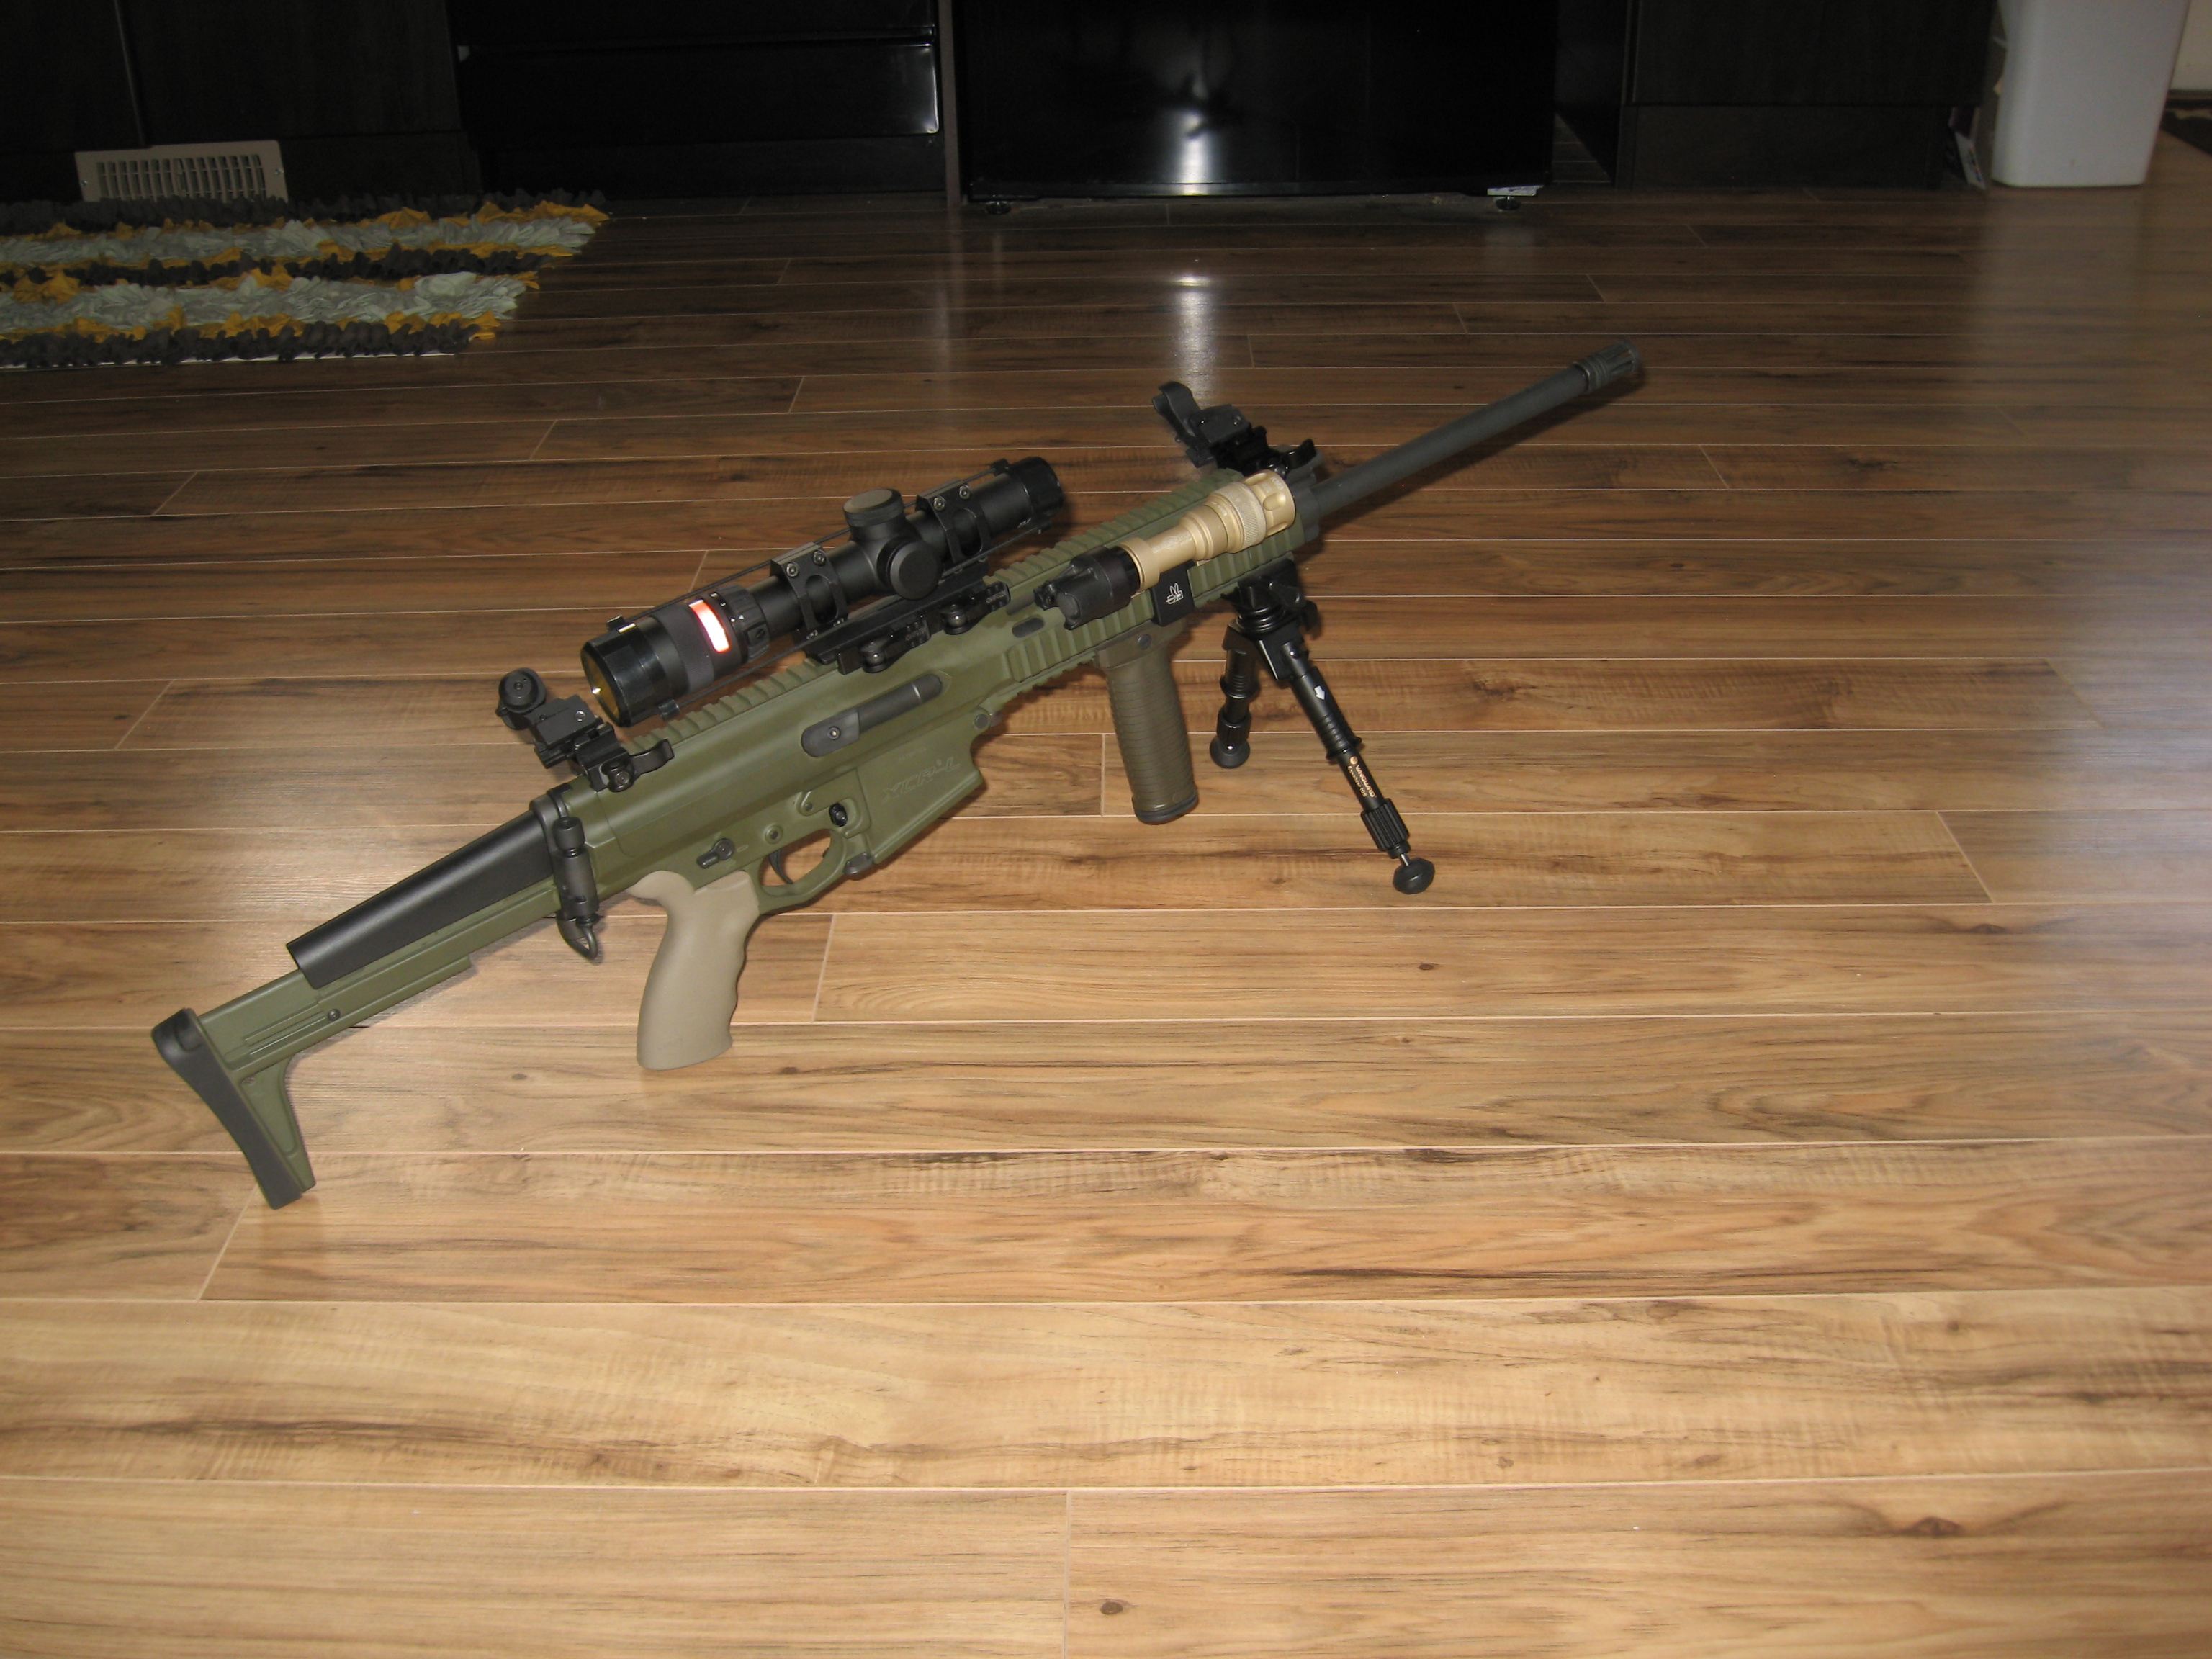 Haley strategic thorntail mount for my surefire-flashlight-mount-003.jpg